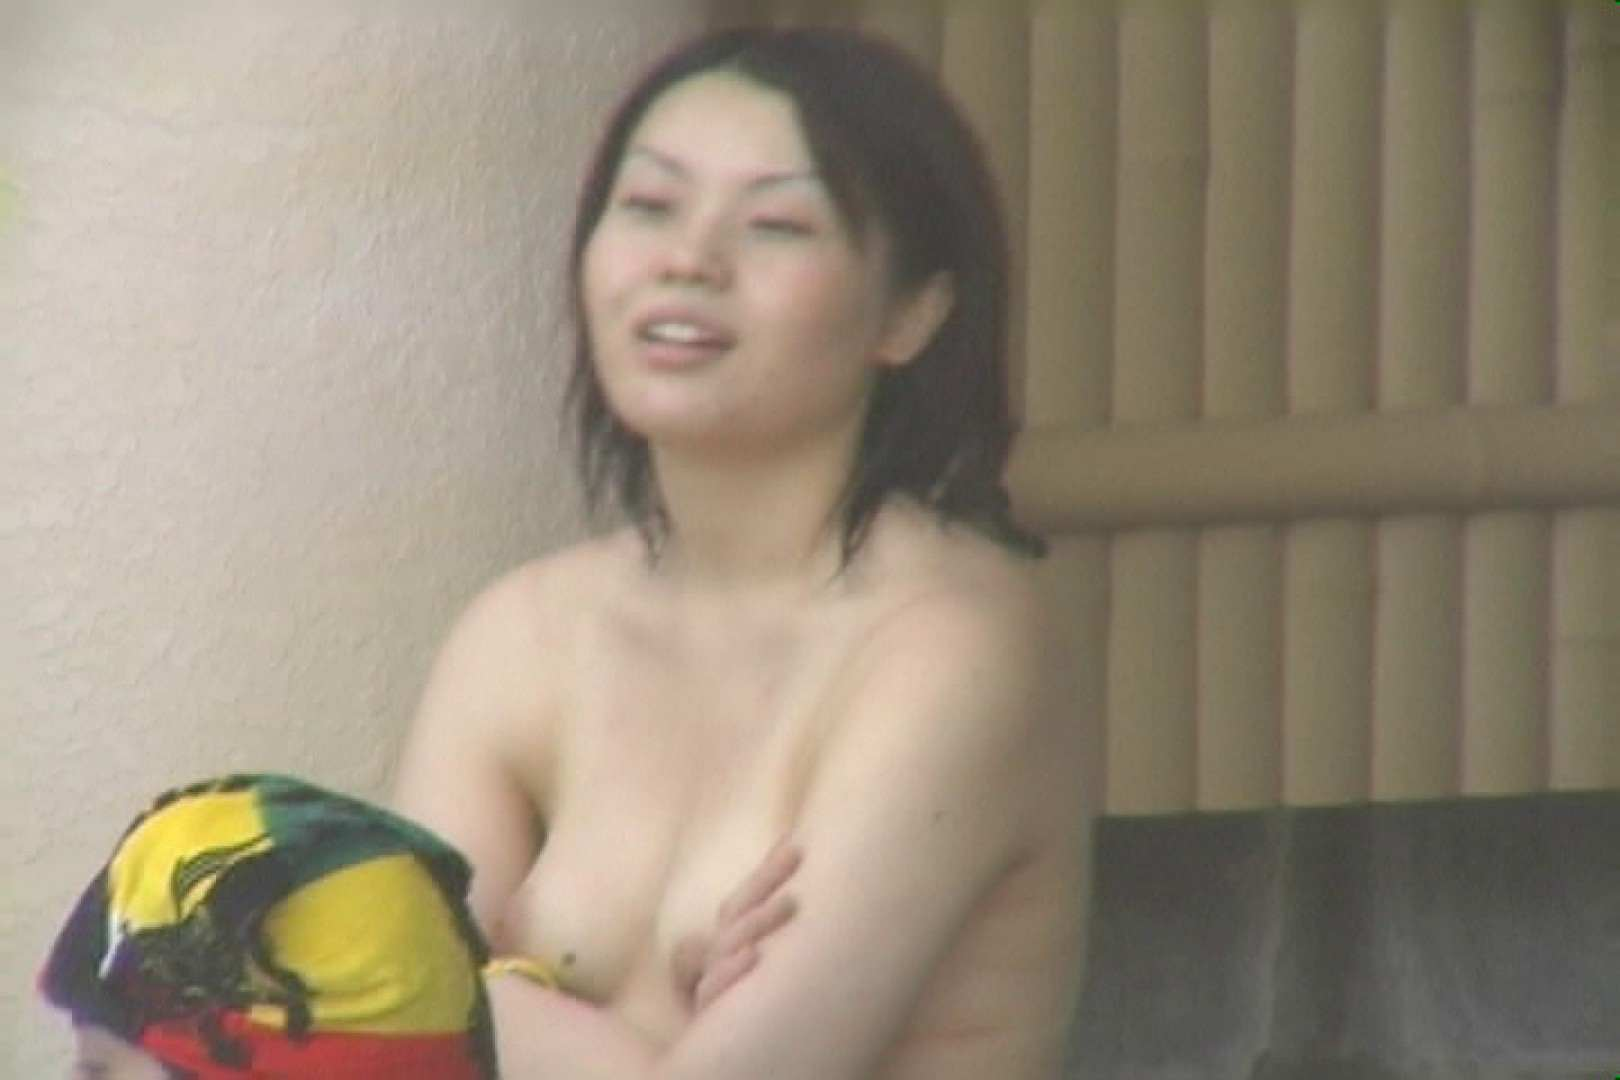 Aquaな露天風呂Vol.61【VIP限定】 露天風呂編   盗撮シリーズ  113PIX 85